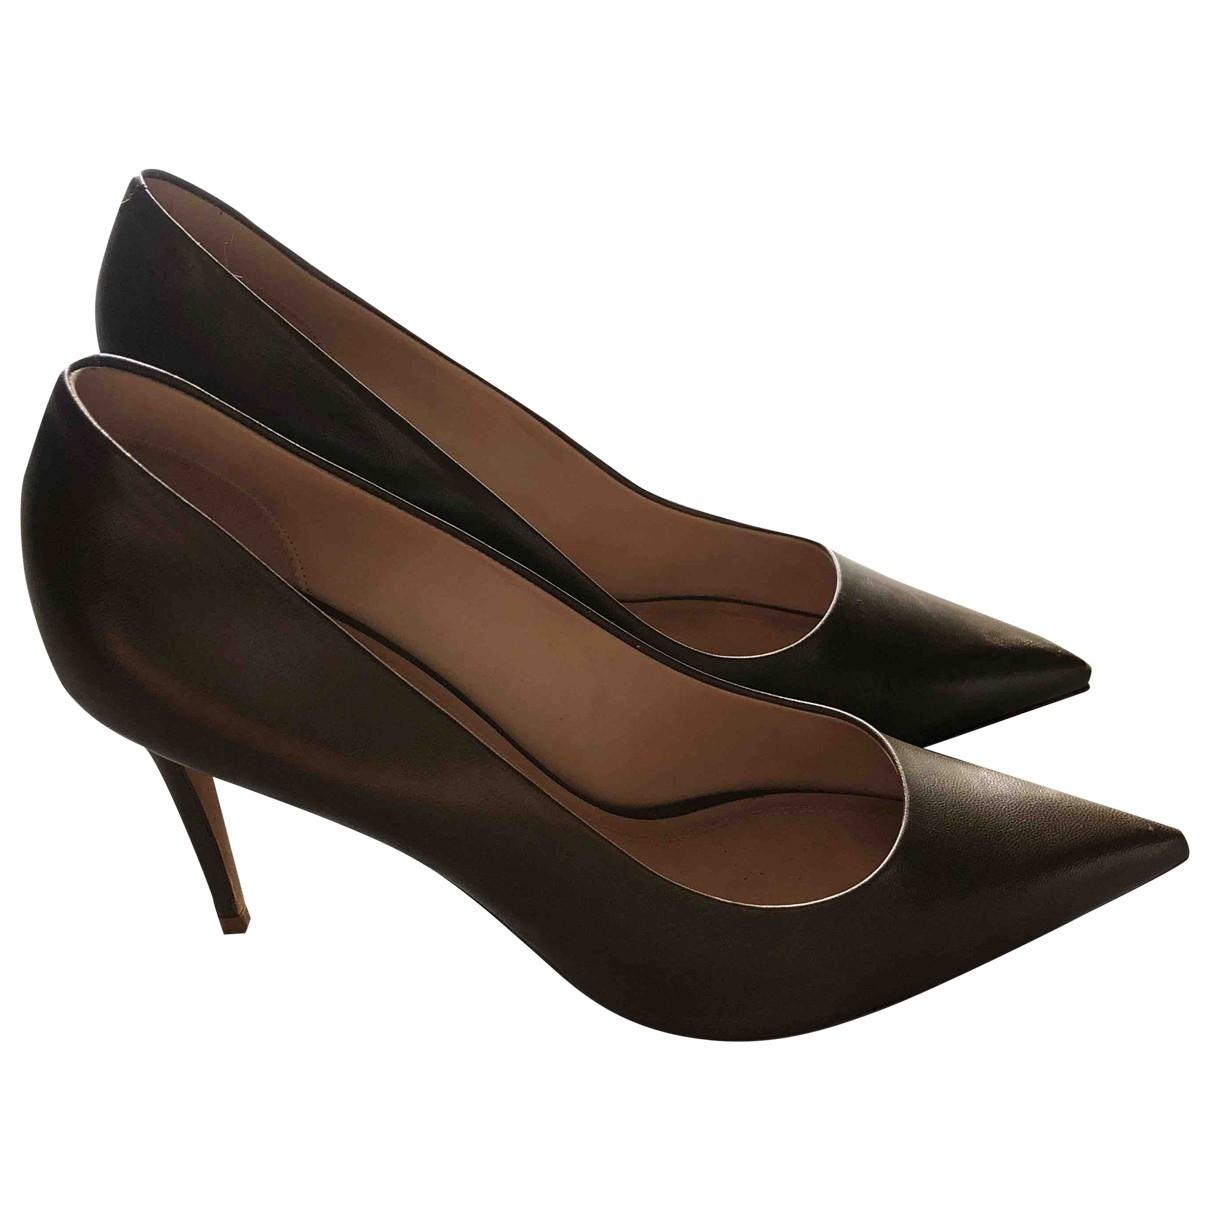 Celine Sharp Khaki Leather Heels for Women 40 EU